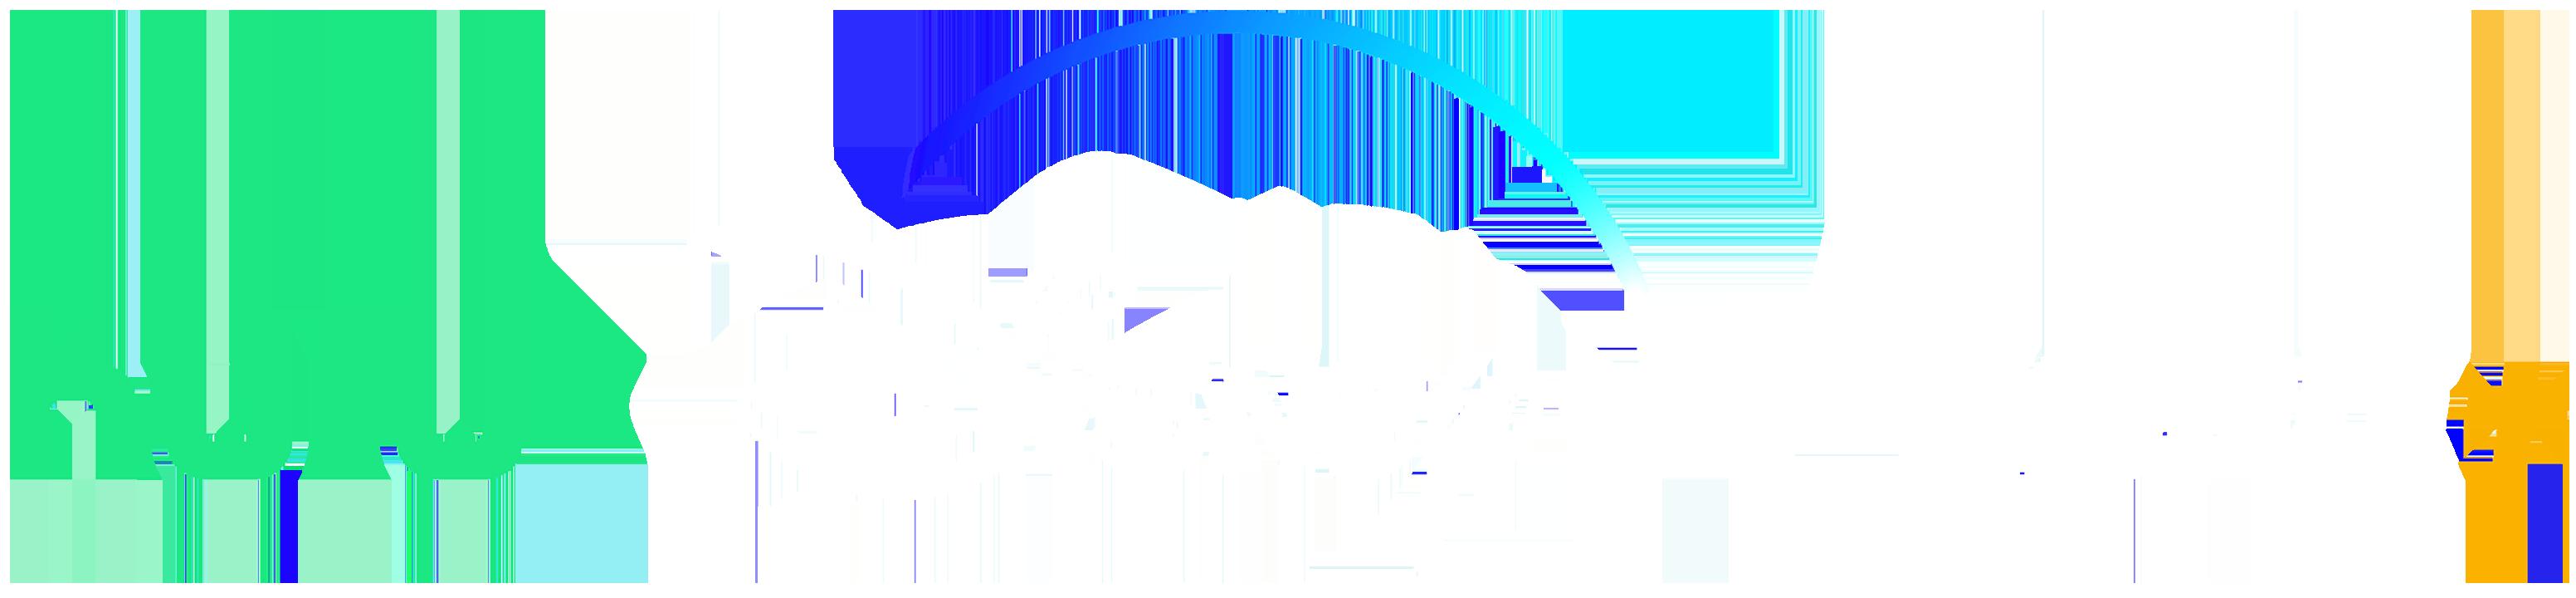 Hulu Disney Espn Bundle Hulu Com